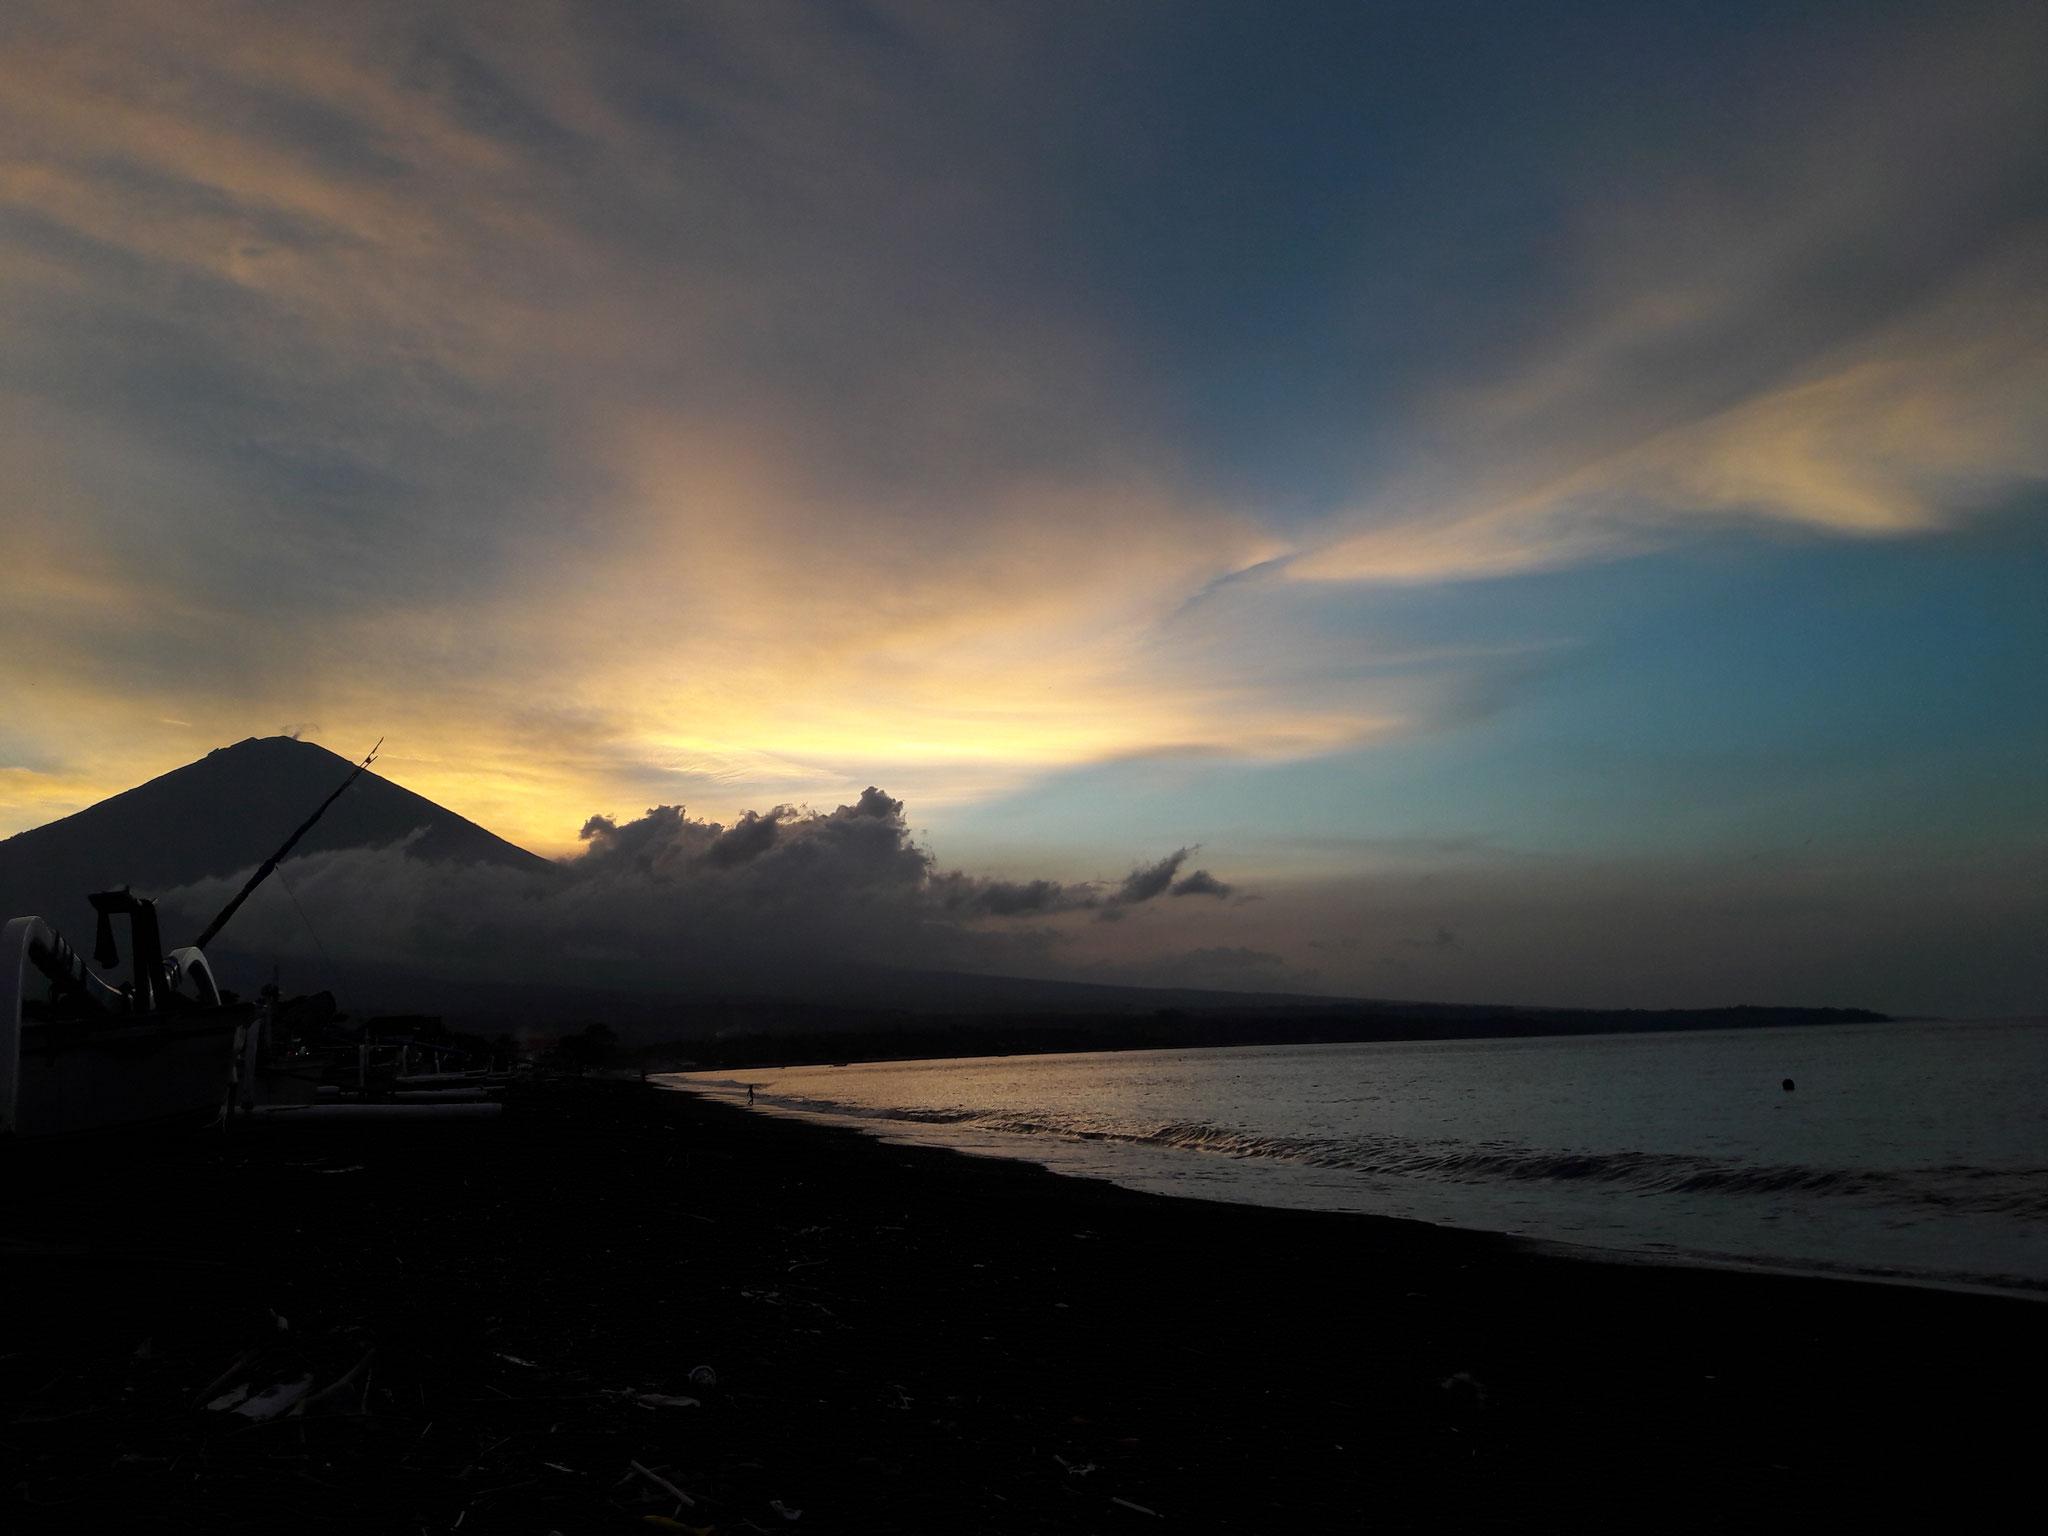 Bulih Beach Bungalows - Beach / Mount Agung / Sunset